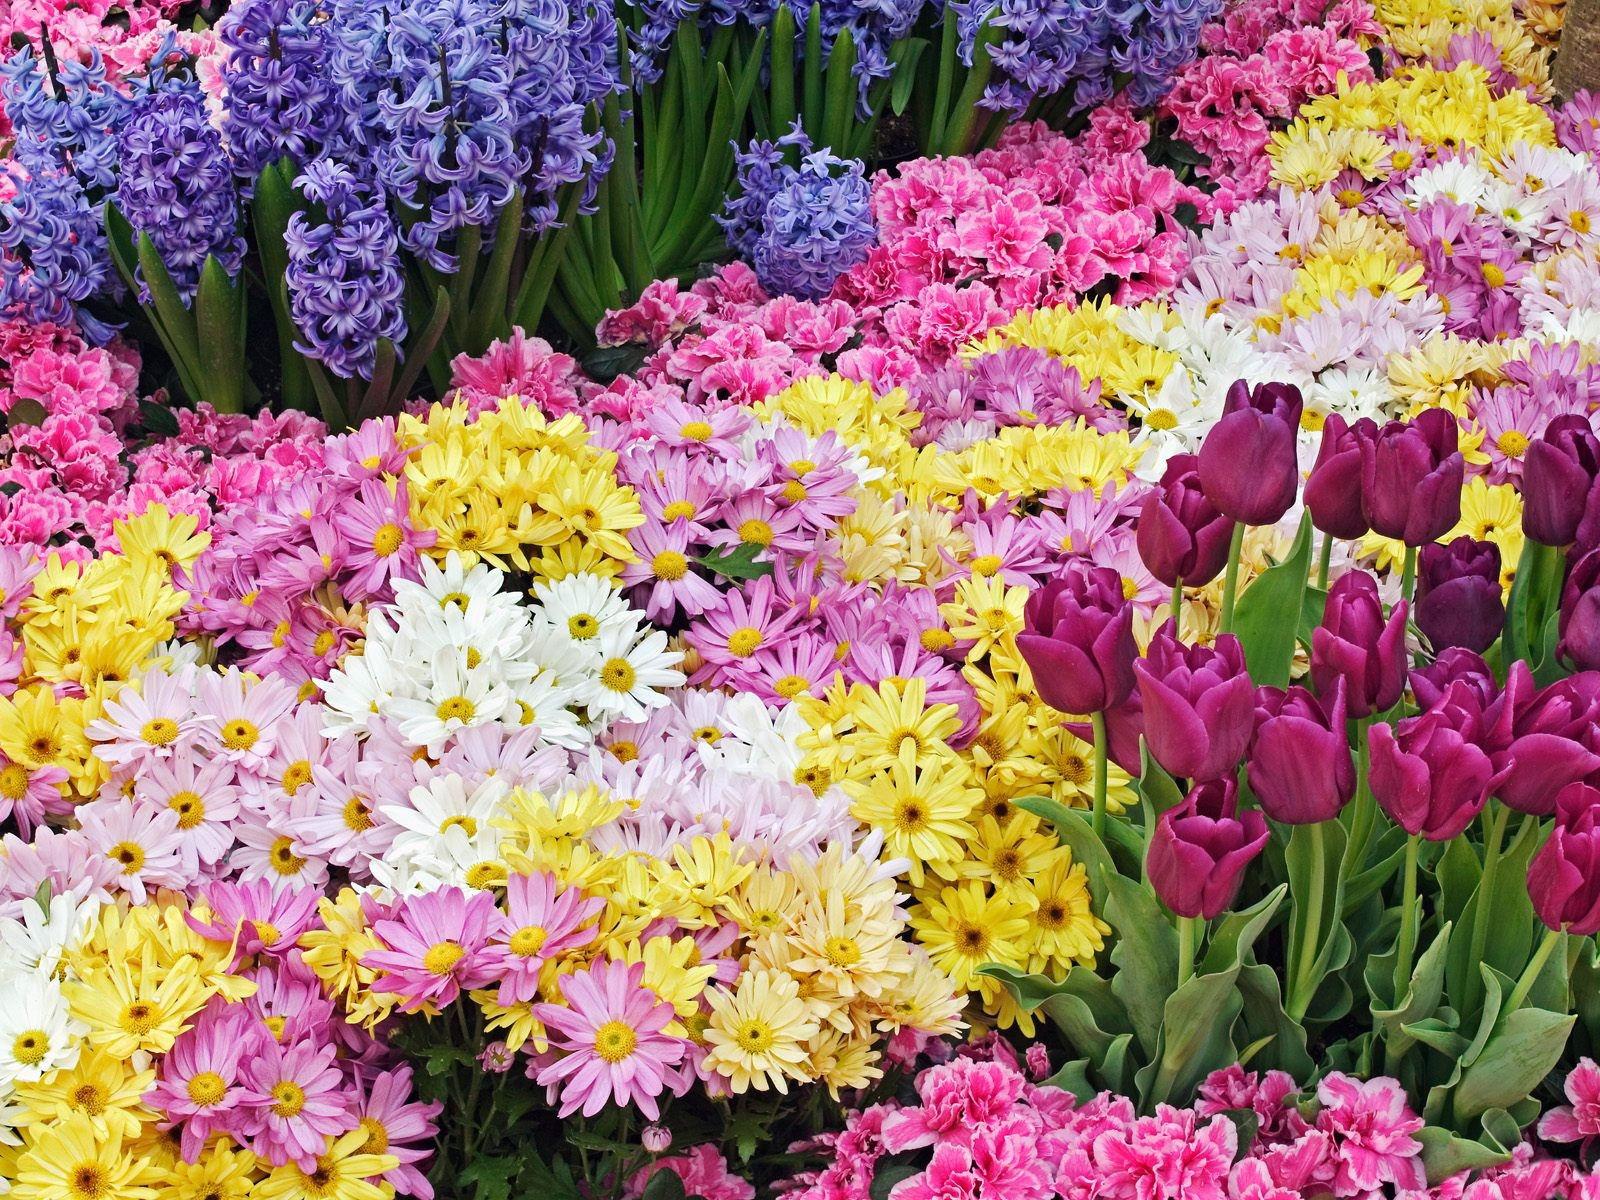 بالصور صور اجمل ورد , اجمل صور لبوكيهات الورد 3493 1